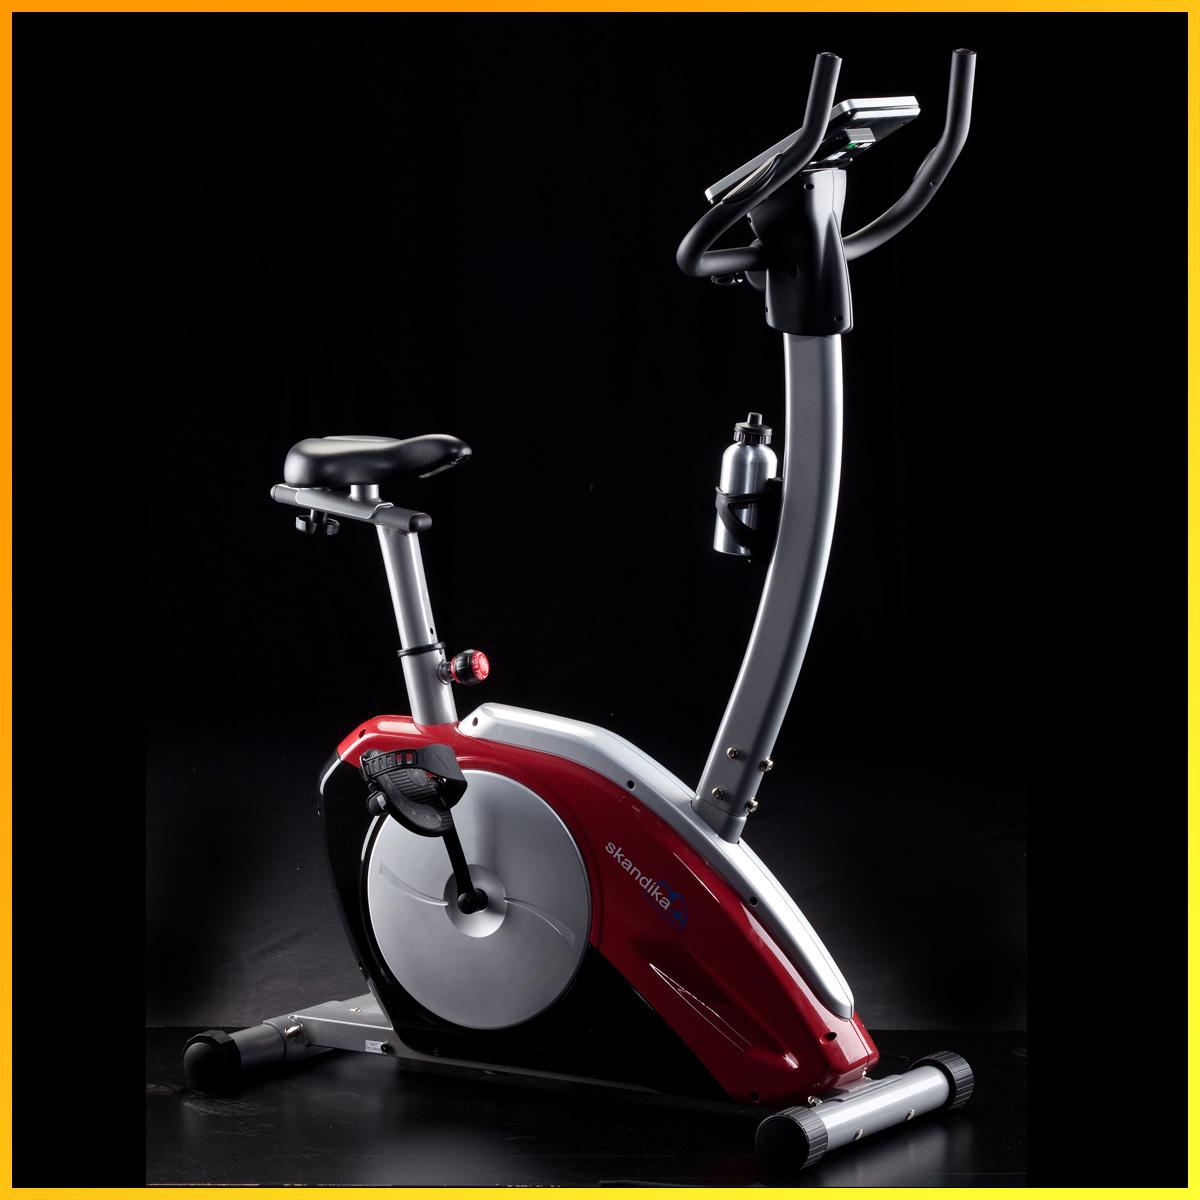 skandika fitness scorpius heimtrainer ergometer fahrrad neu ebay. Black Bedroom Furniture Sets. Home Design Ideas